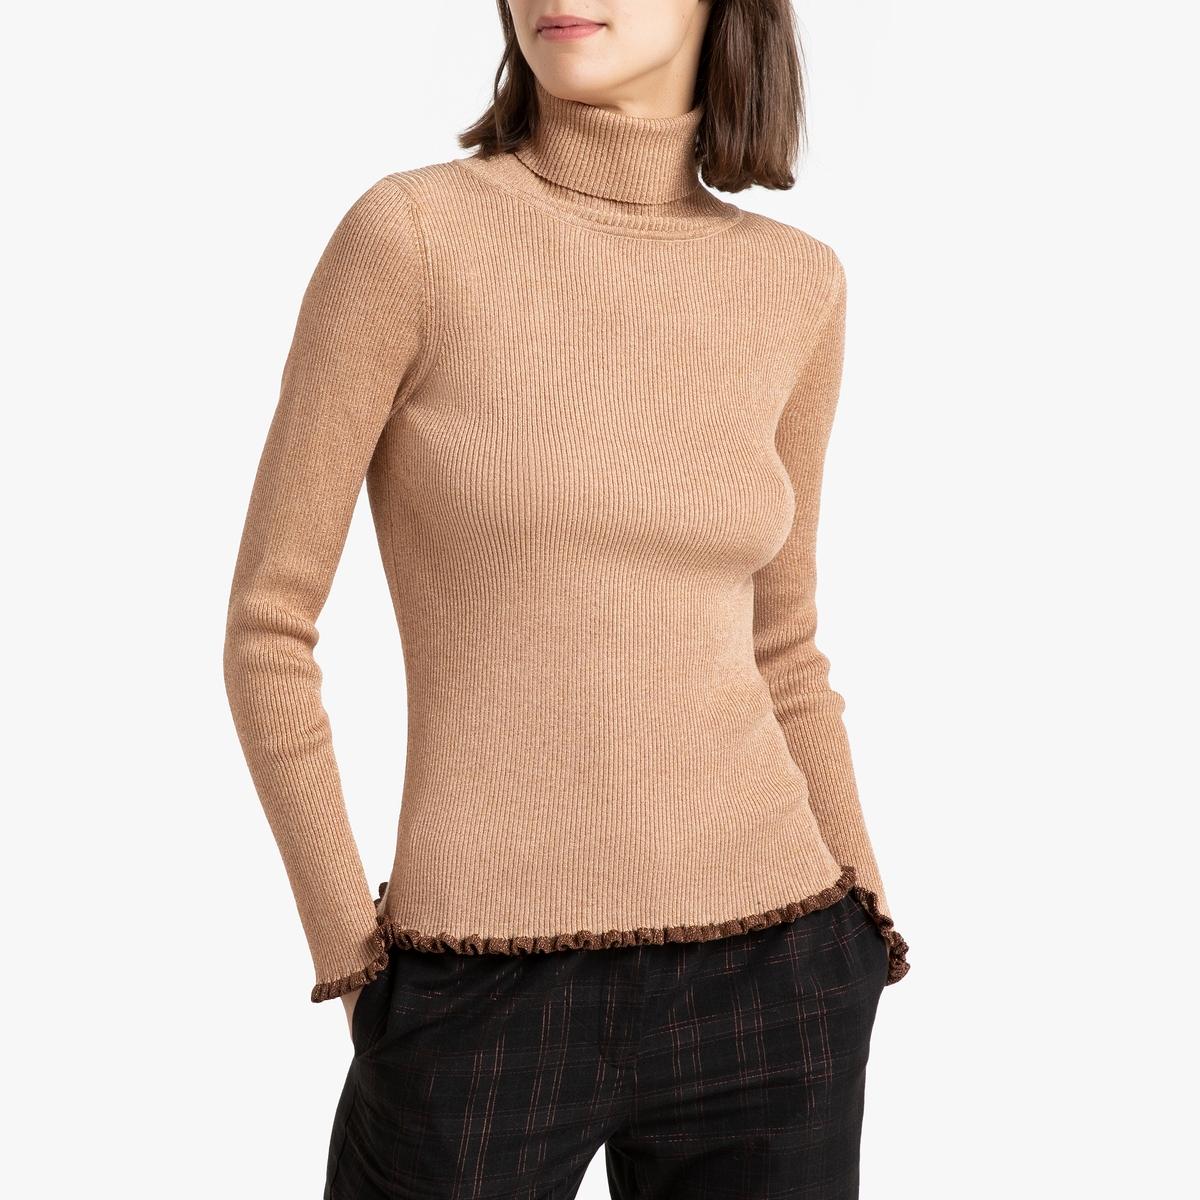 Пуловер La Redoute С отворачивающимся воротником из тонкого блестящего трикотажа PEYO 3(L) желтый